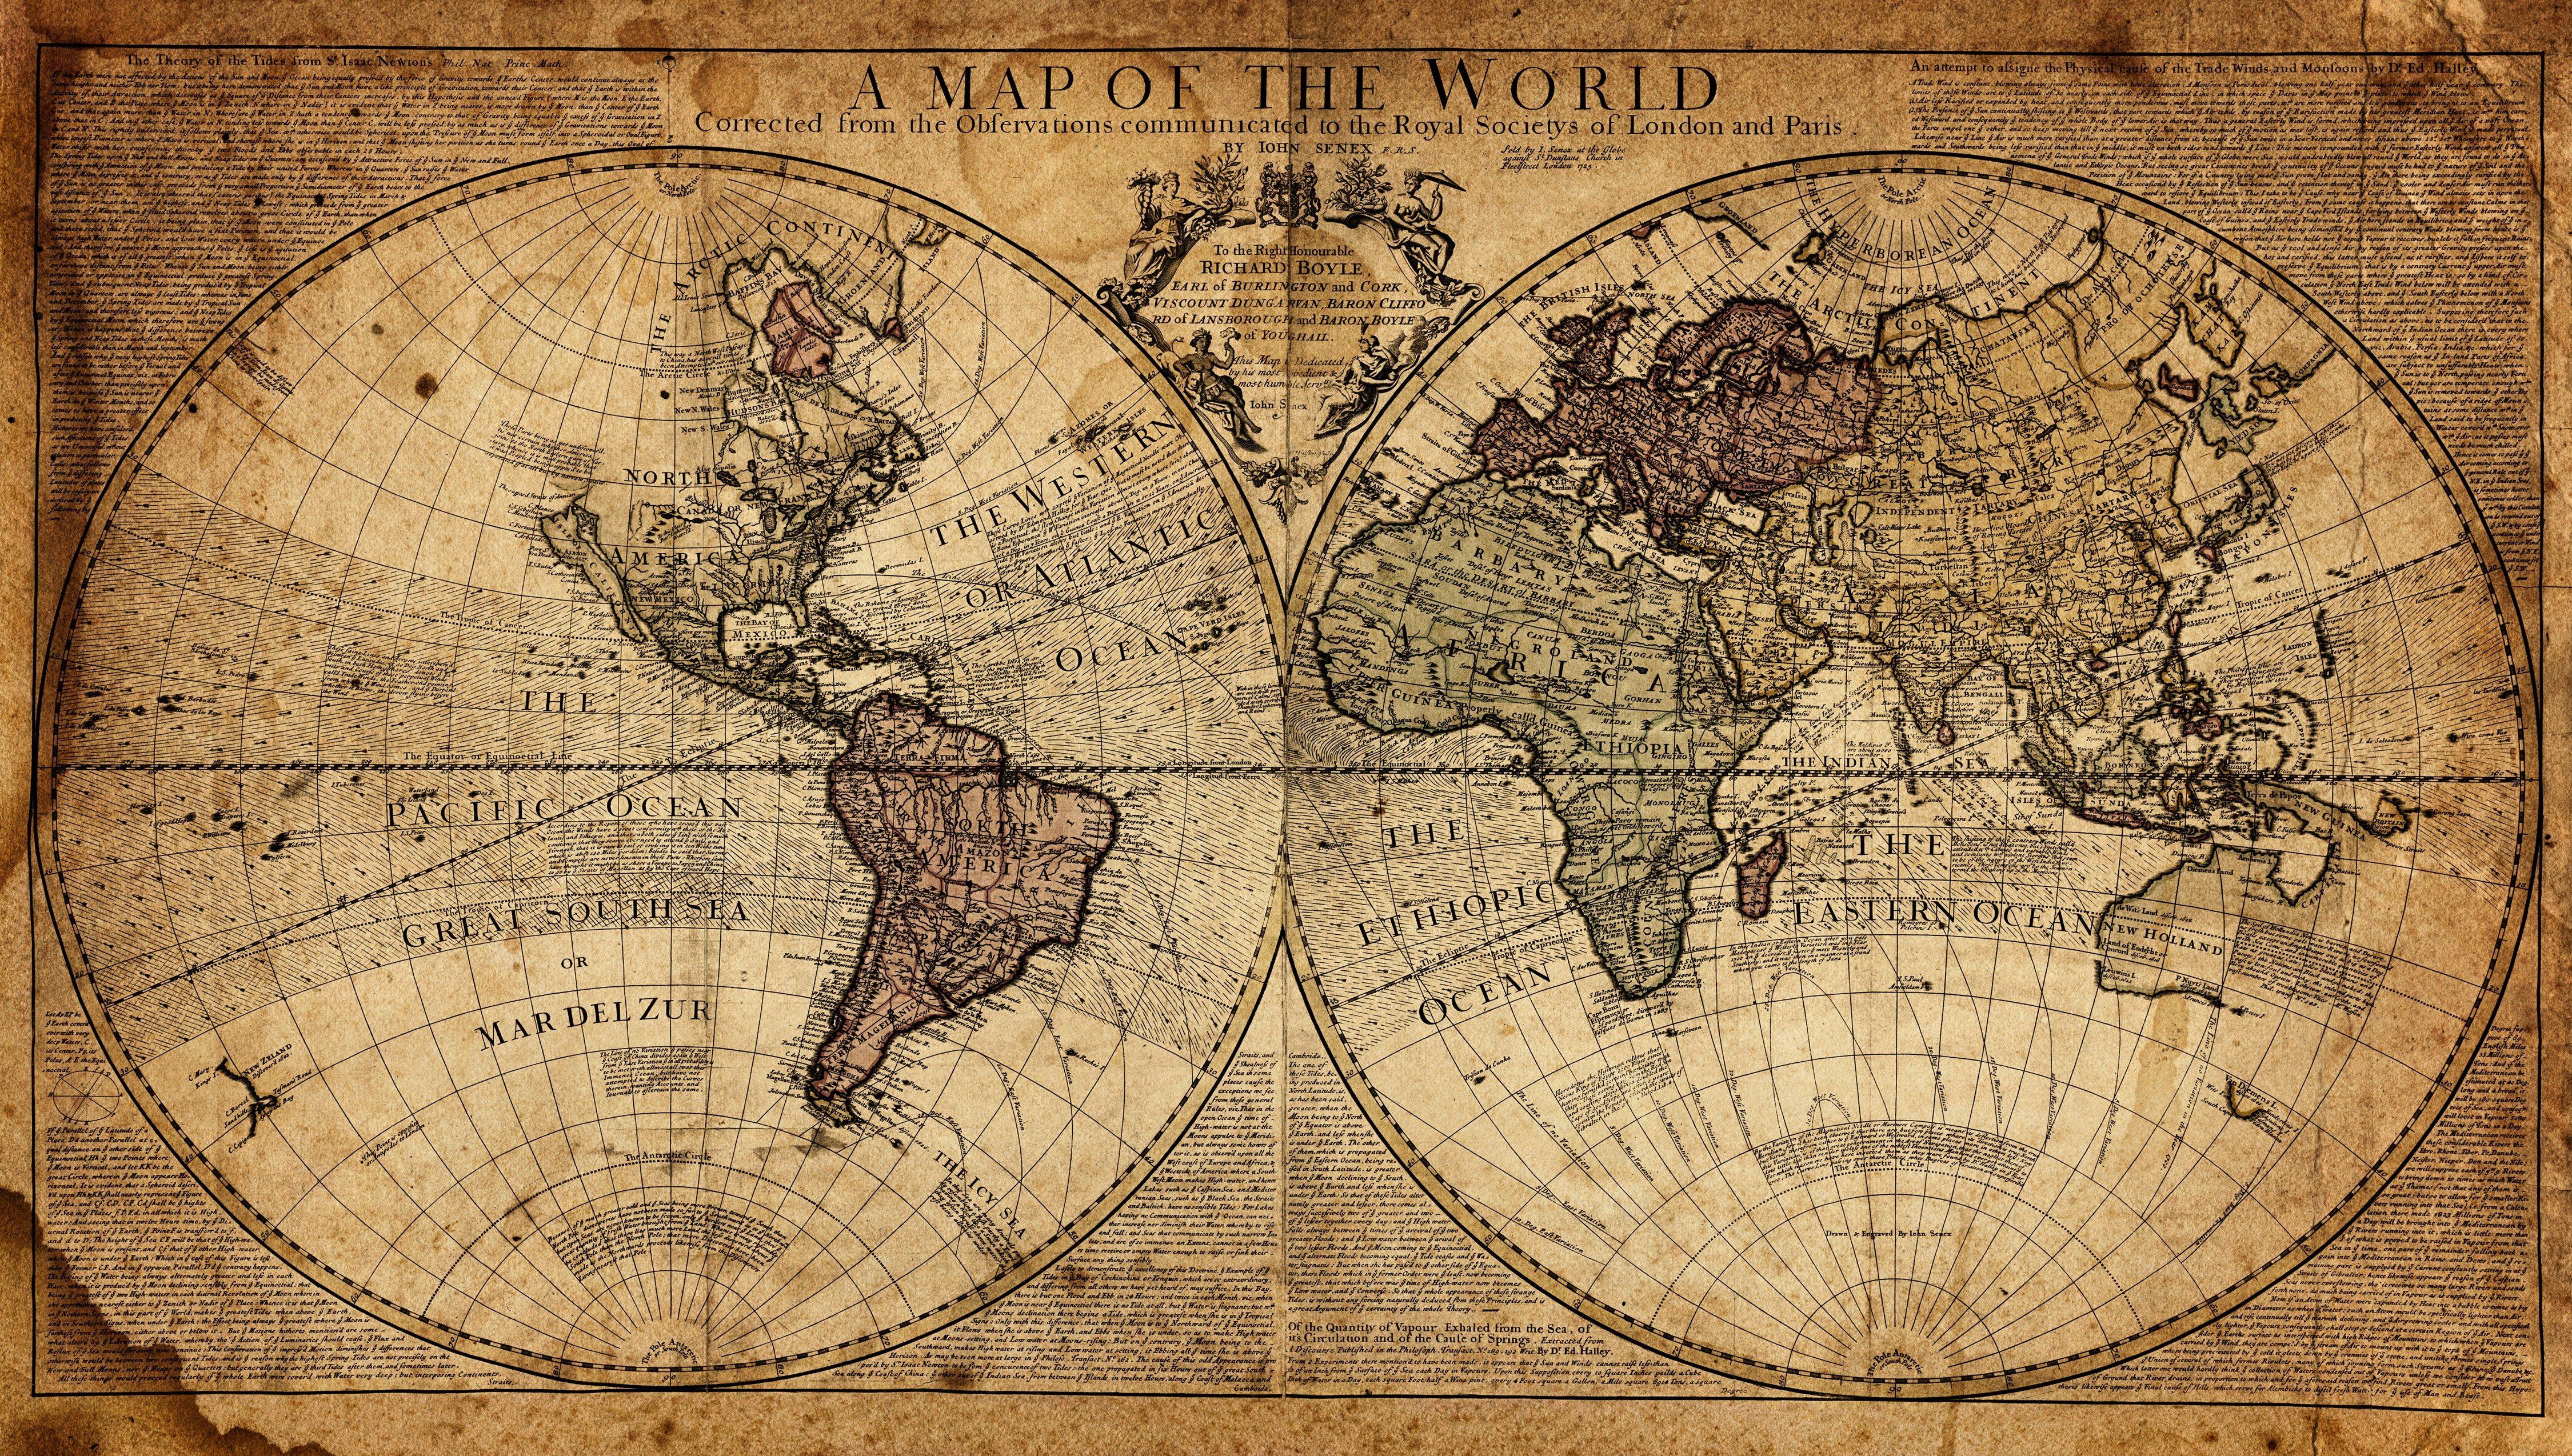 Map desktop wallpapers download wallpaper high full hd full 4k world map hd wallpaper 4500x2548 gogolmogol pinterest hd 4k world map hd wallpaper 4500x2548 gumiabroncs Image collections